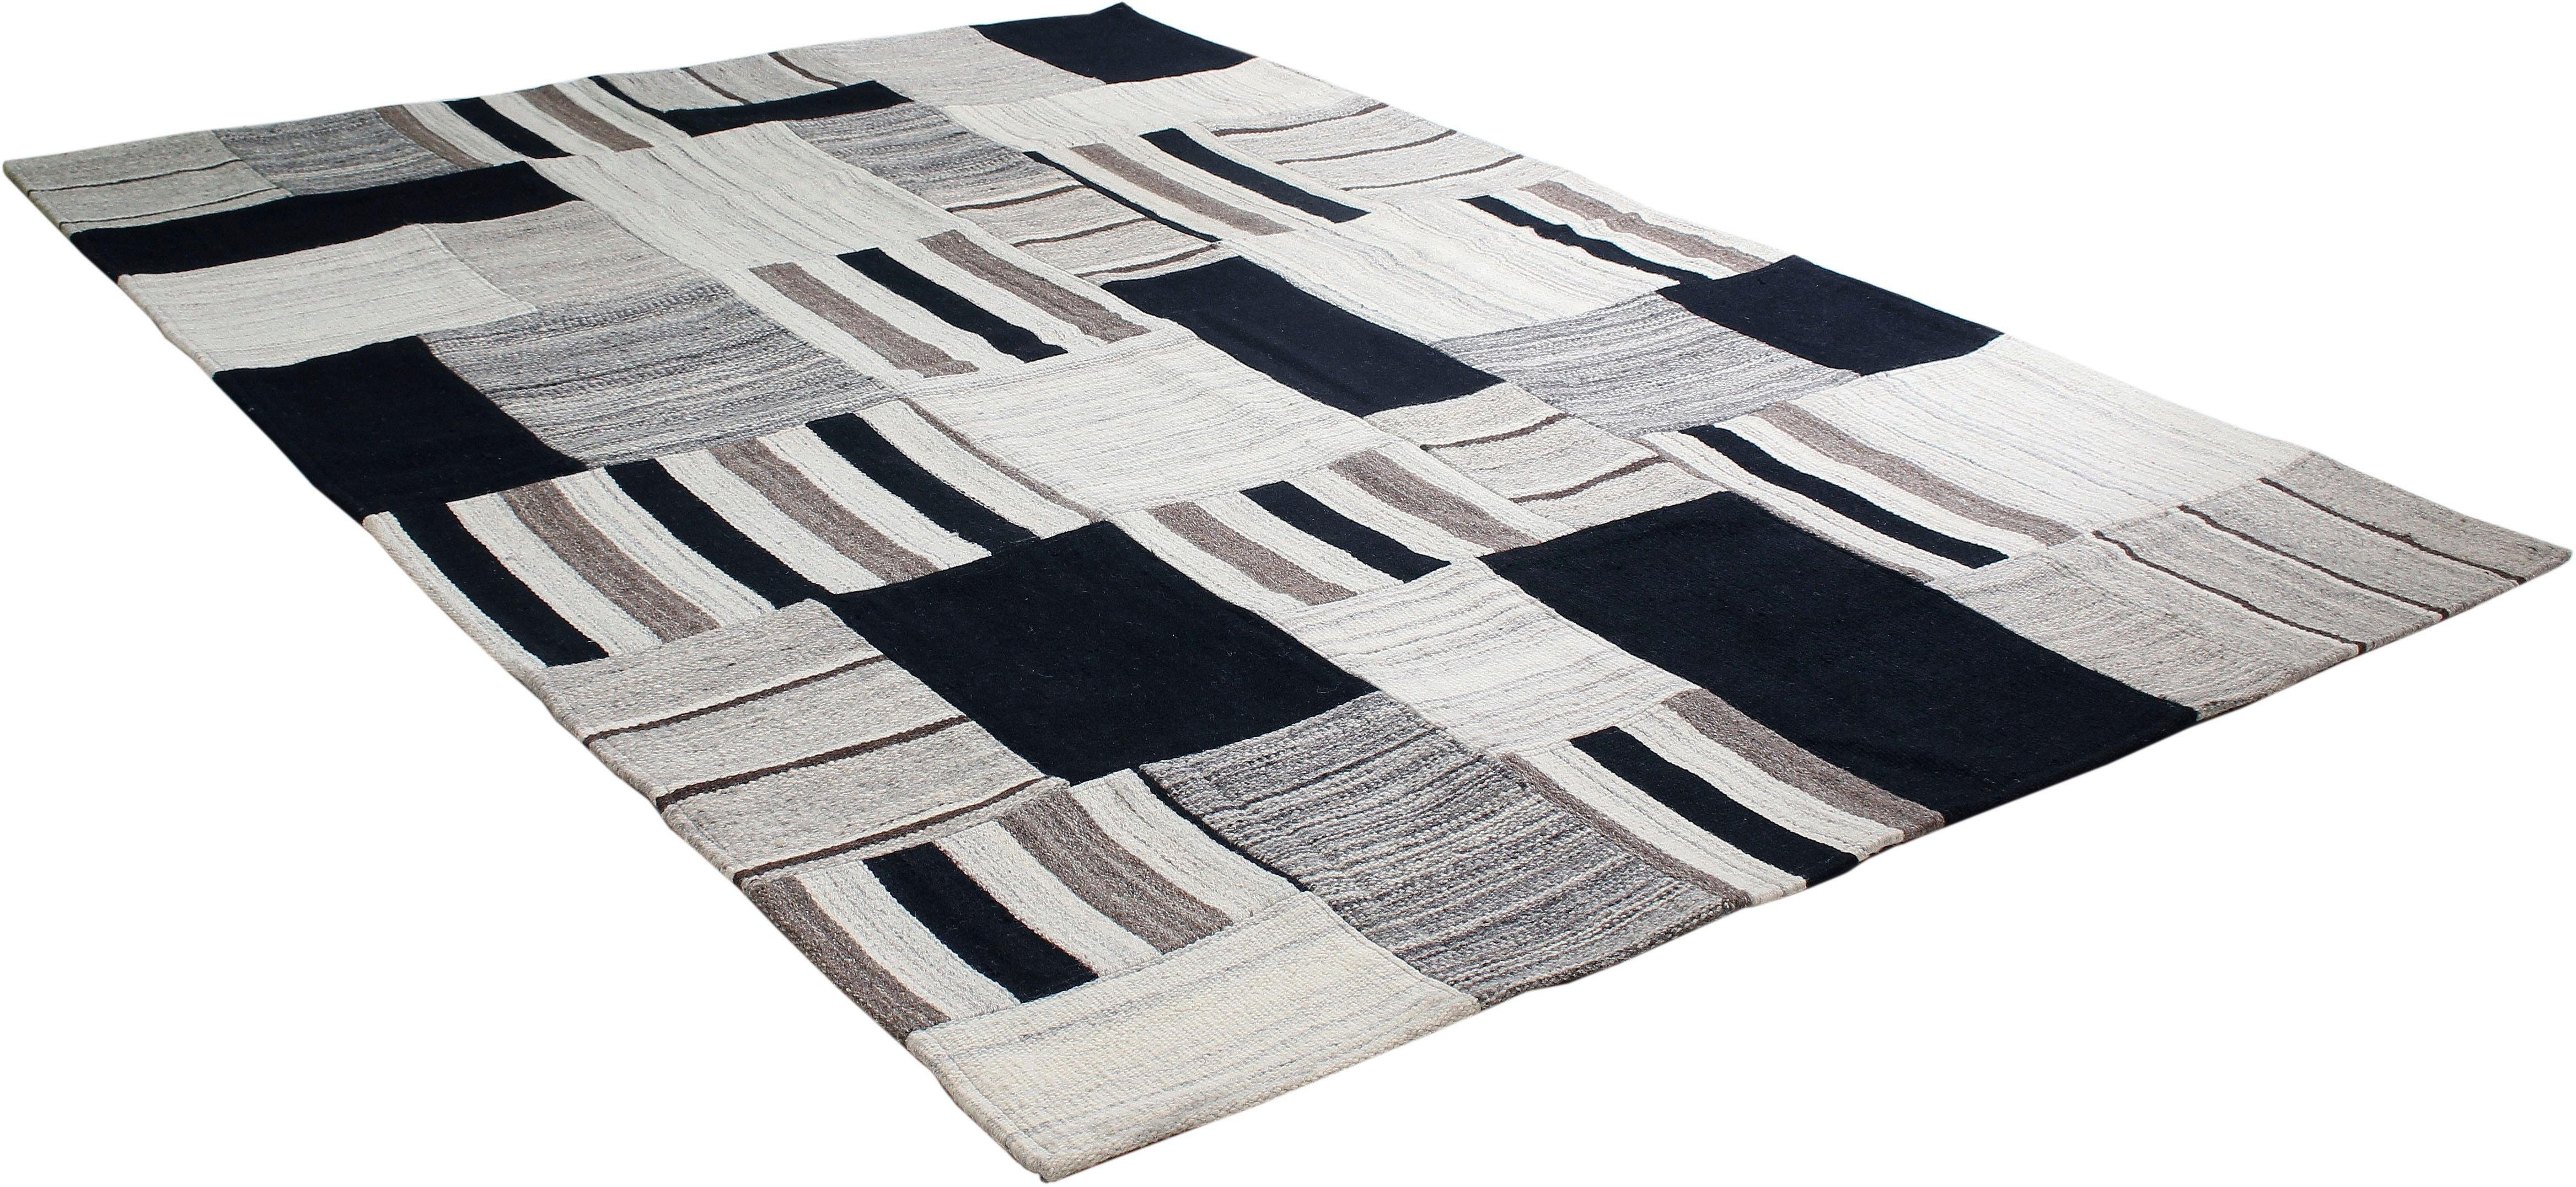 Teppich Shemar 810 calo-deluxe rechteckig Höhe 12 mm handgewebt